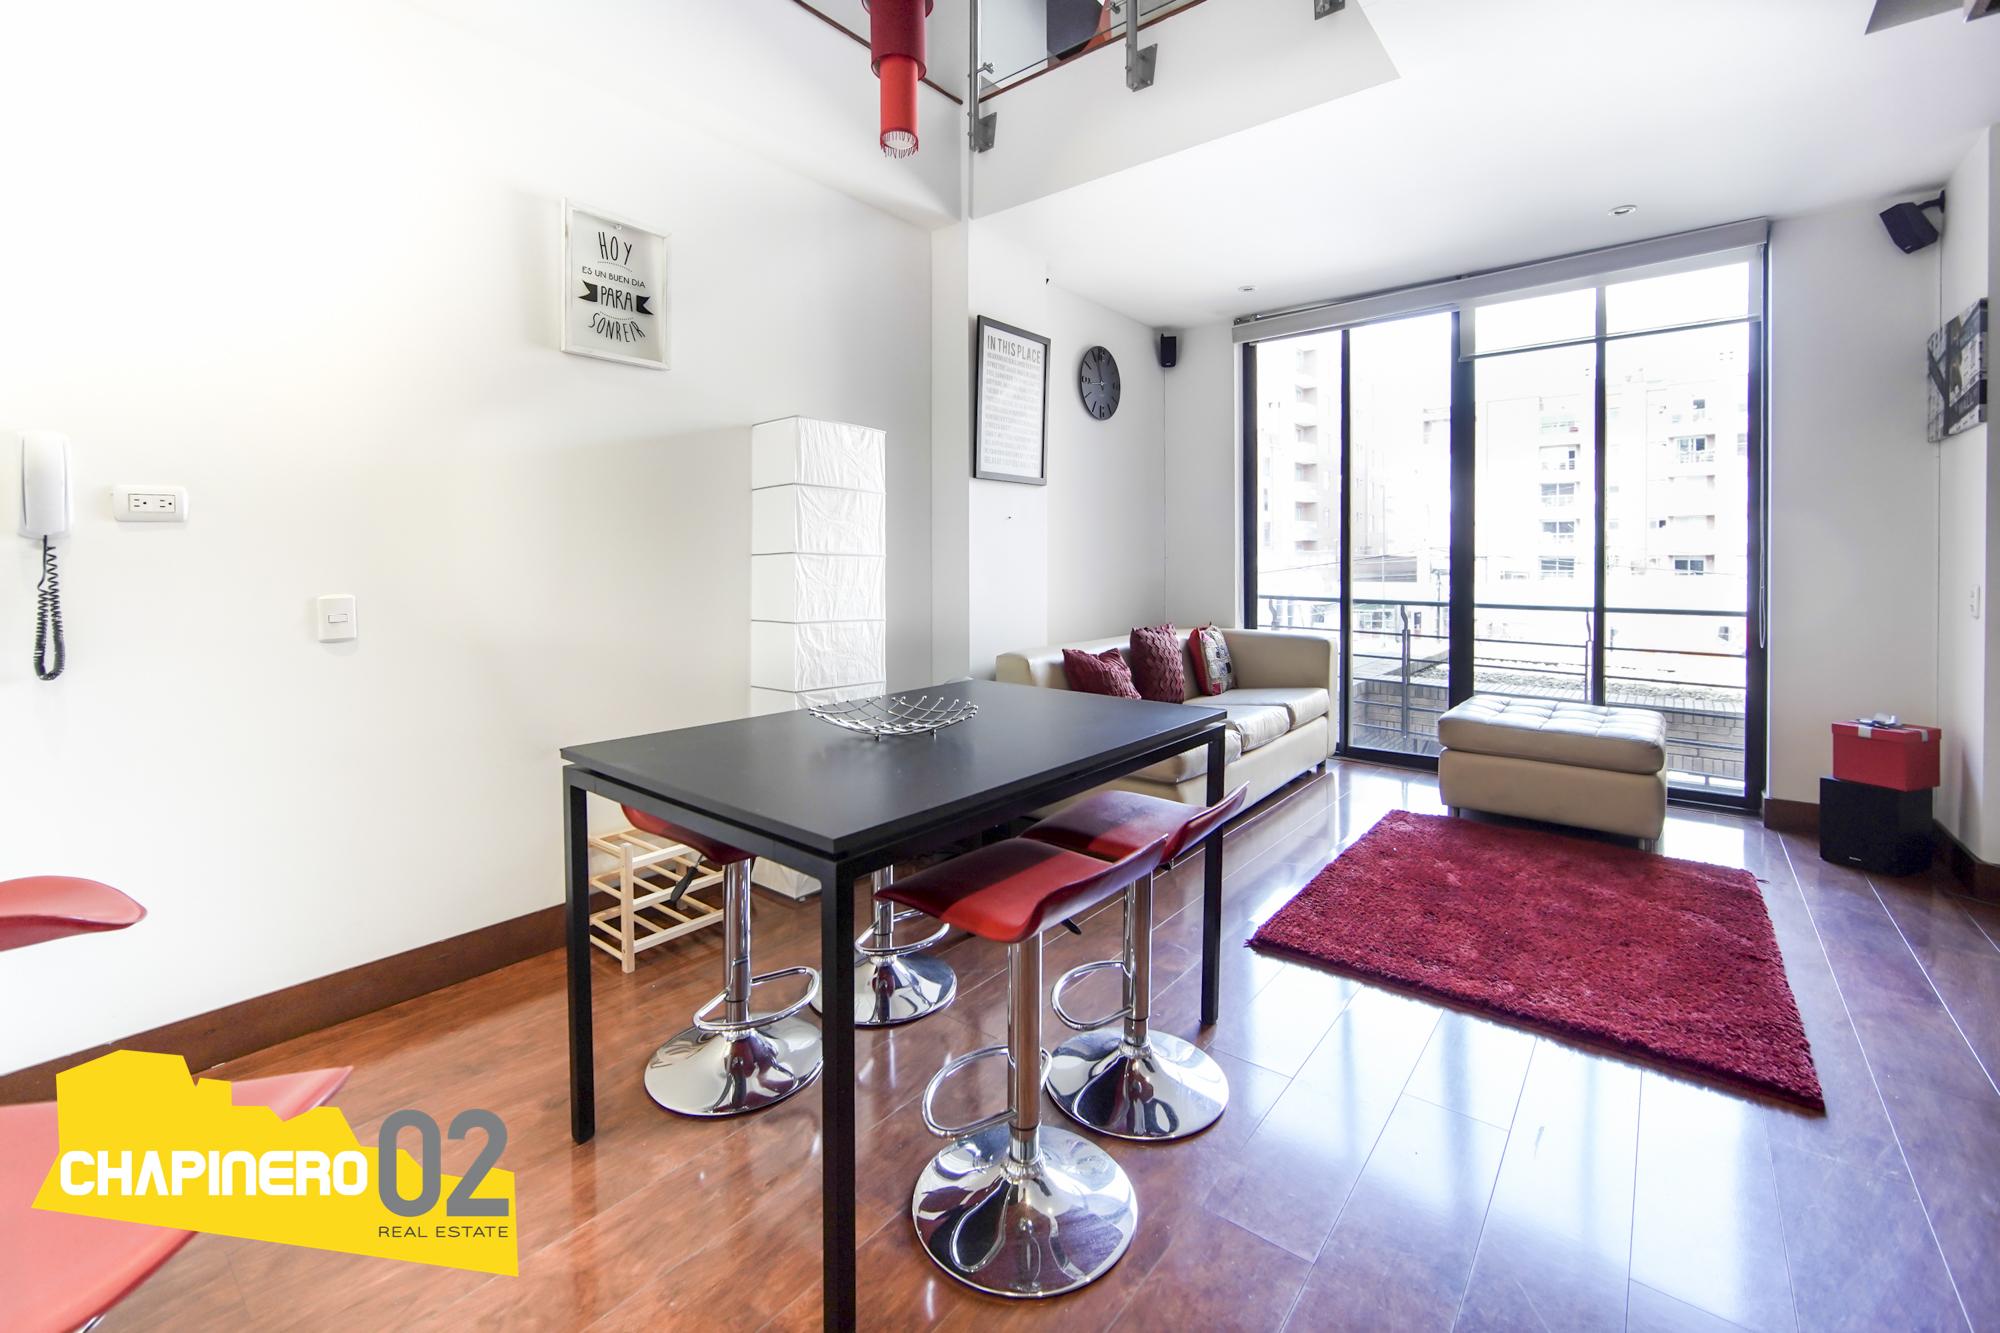 Apto Amoblado :: 76 m² :: Chicó Norte 3 :: $3,3 M